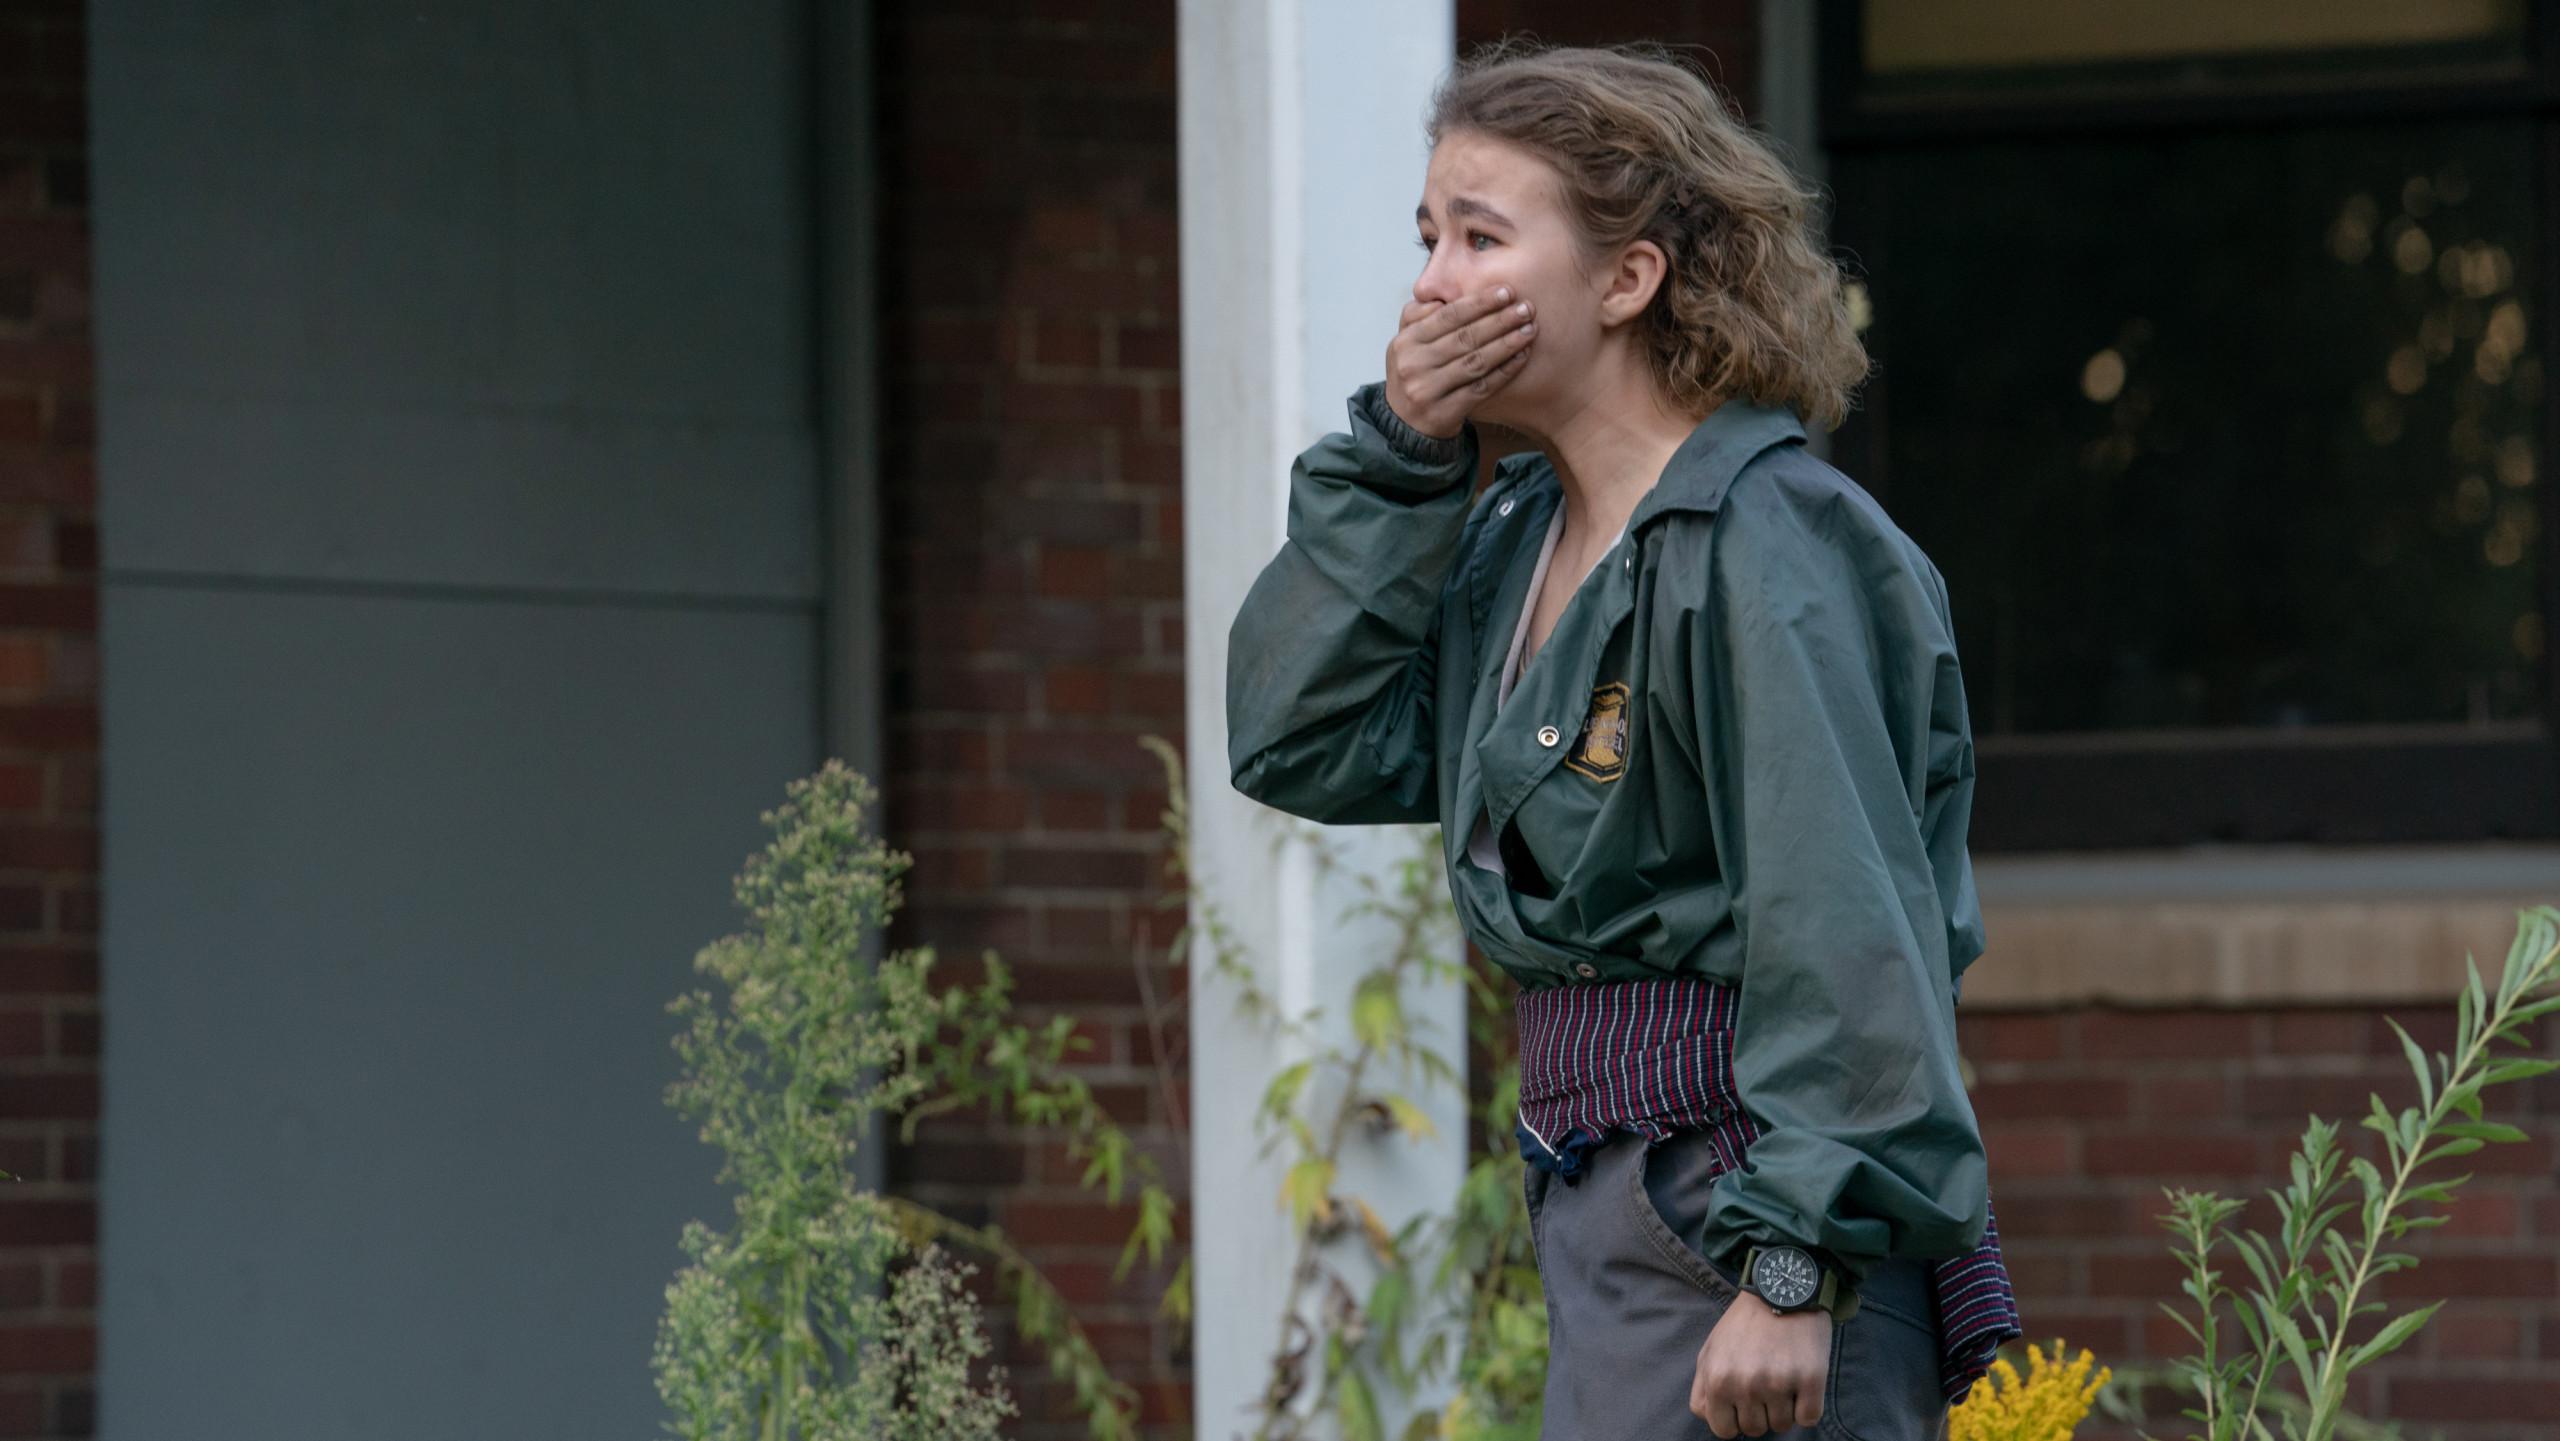 Millicent Simmonds as Regan in A Quiet Place Part II